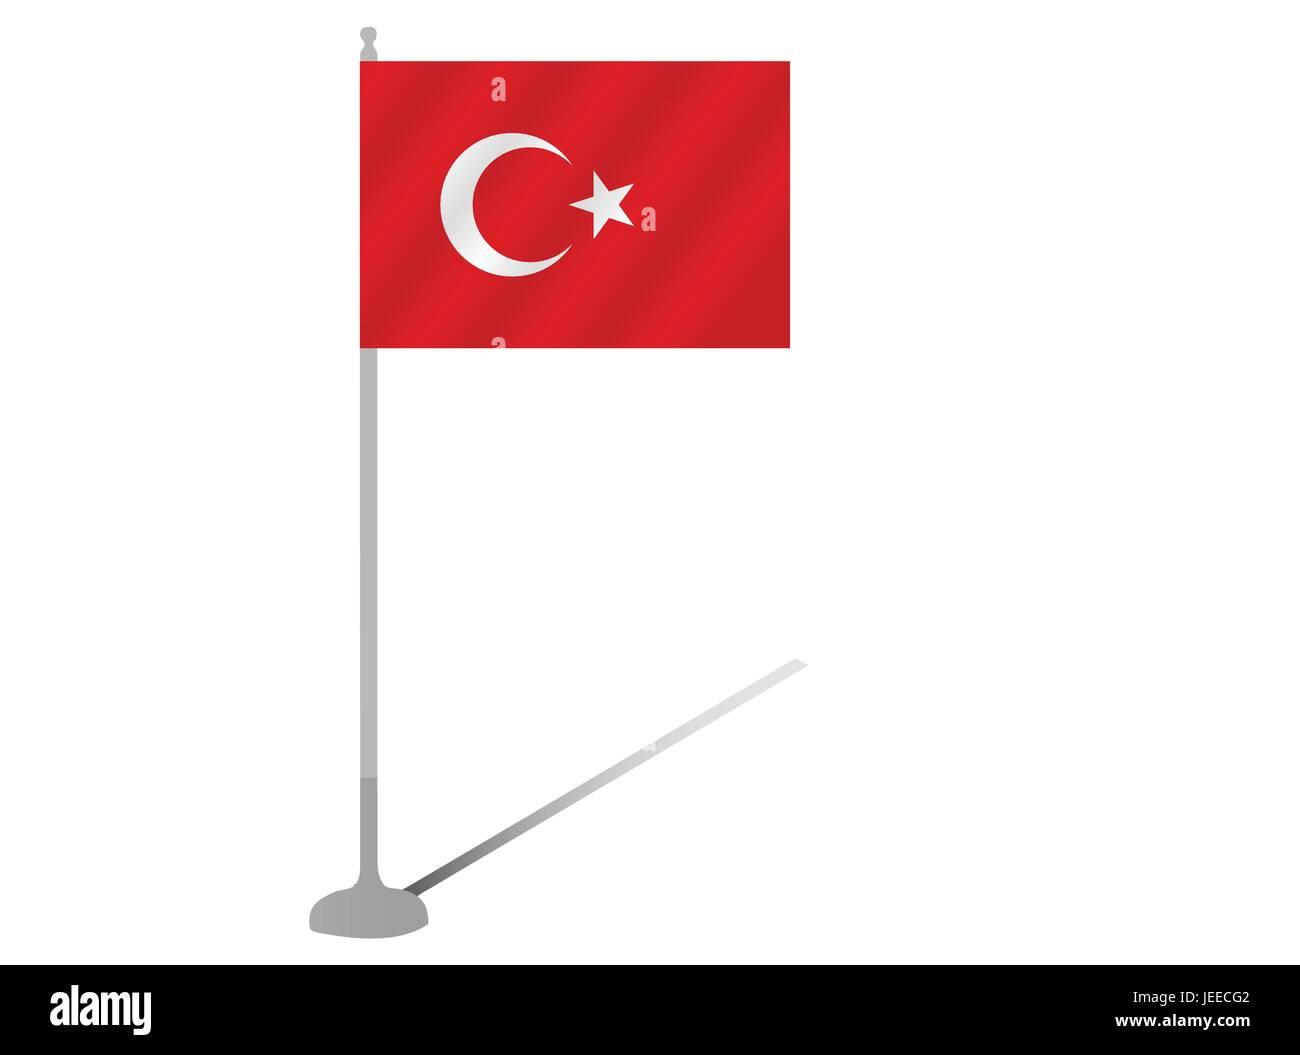 EPS 10 vector illustration of Flag Pole Turkey silhouette on white background - Stock Vector